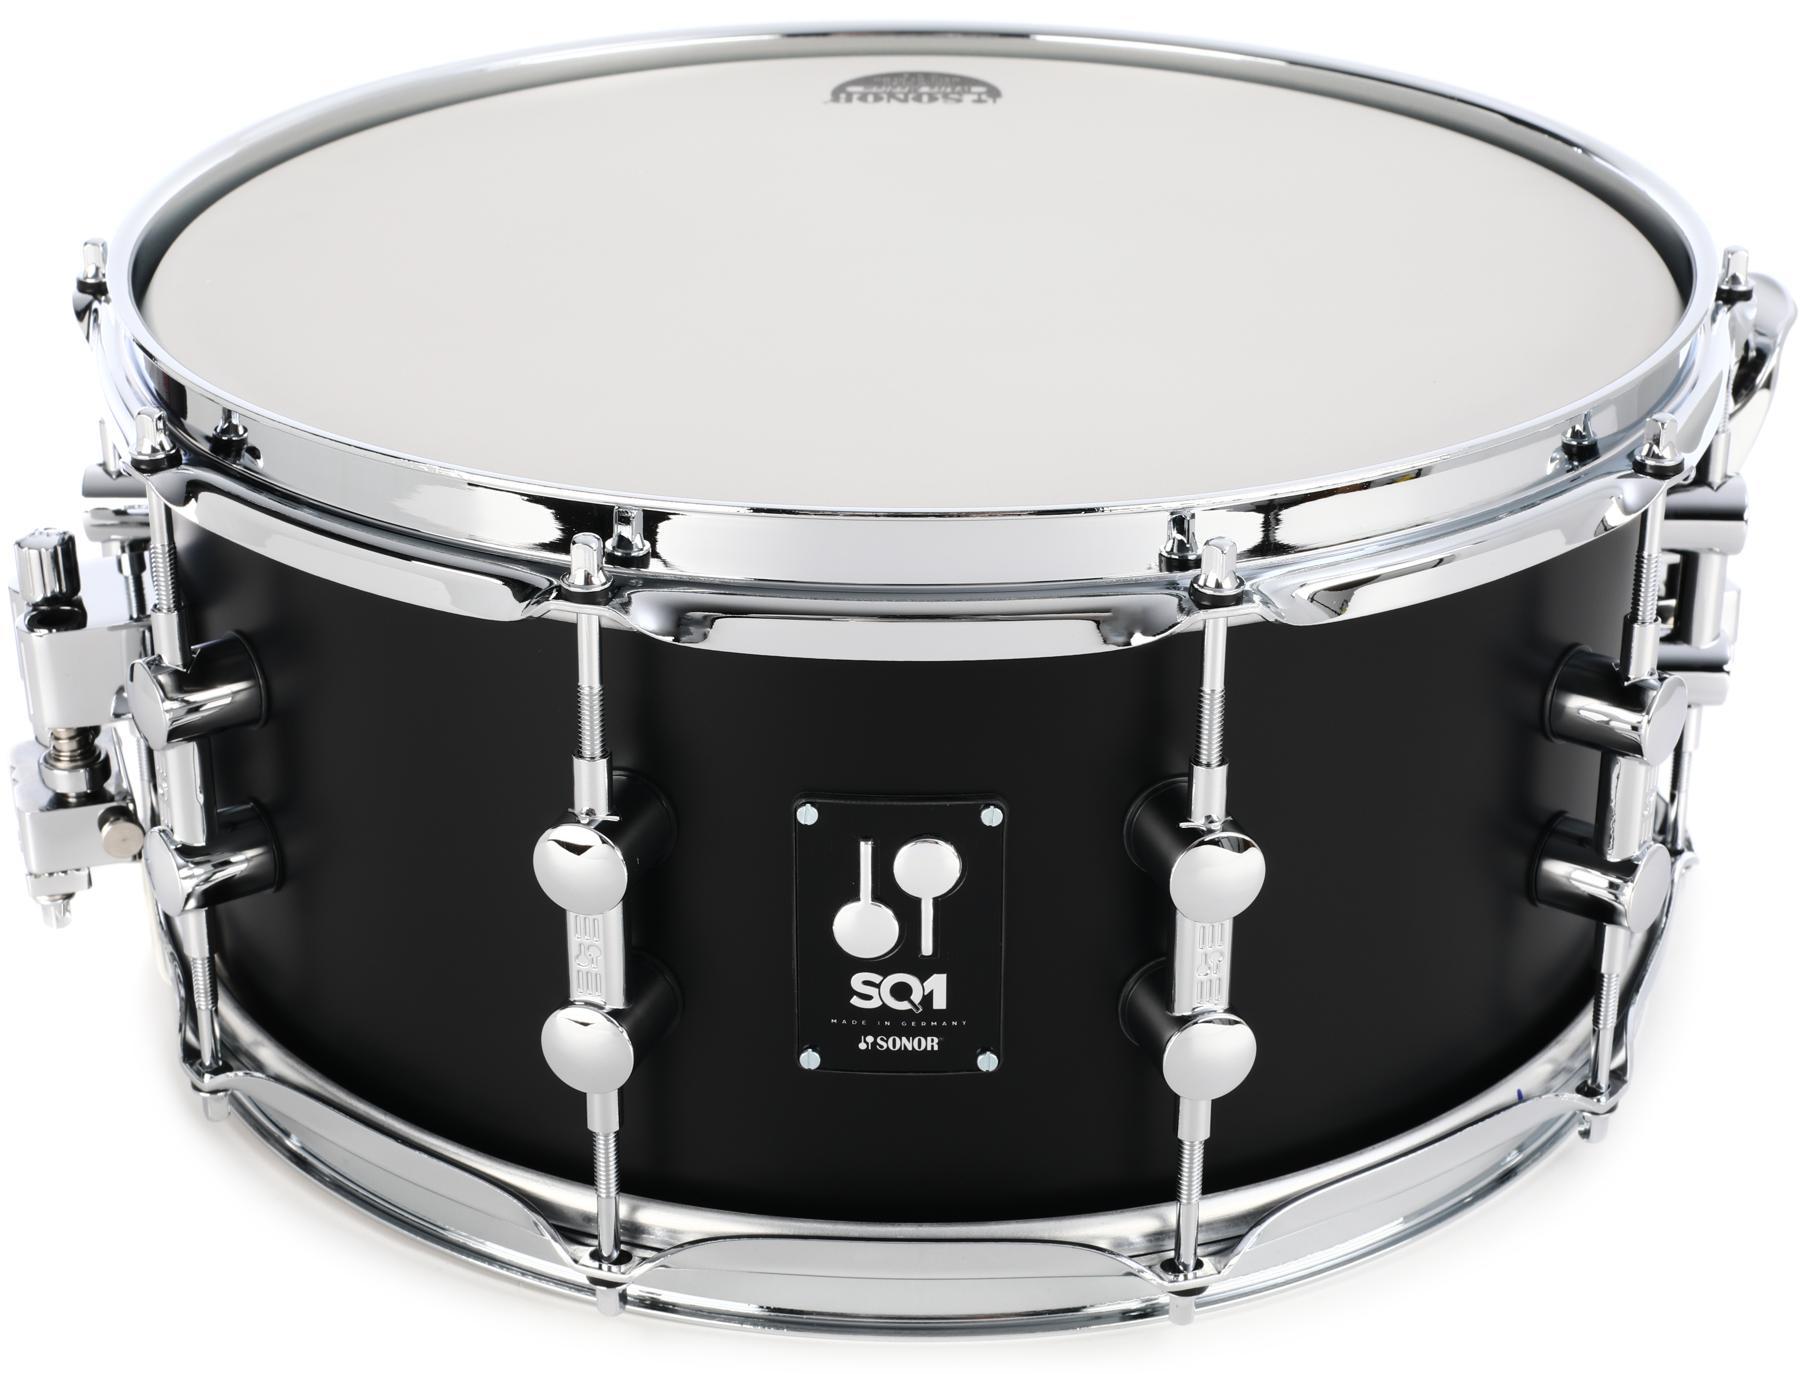 7. Sonor SQ1 Snare Drum 14 x 6.5 in